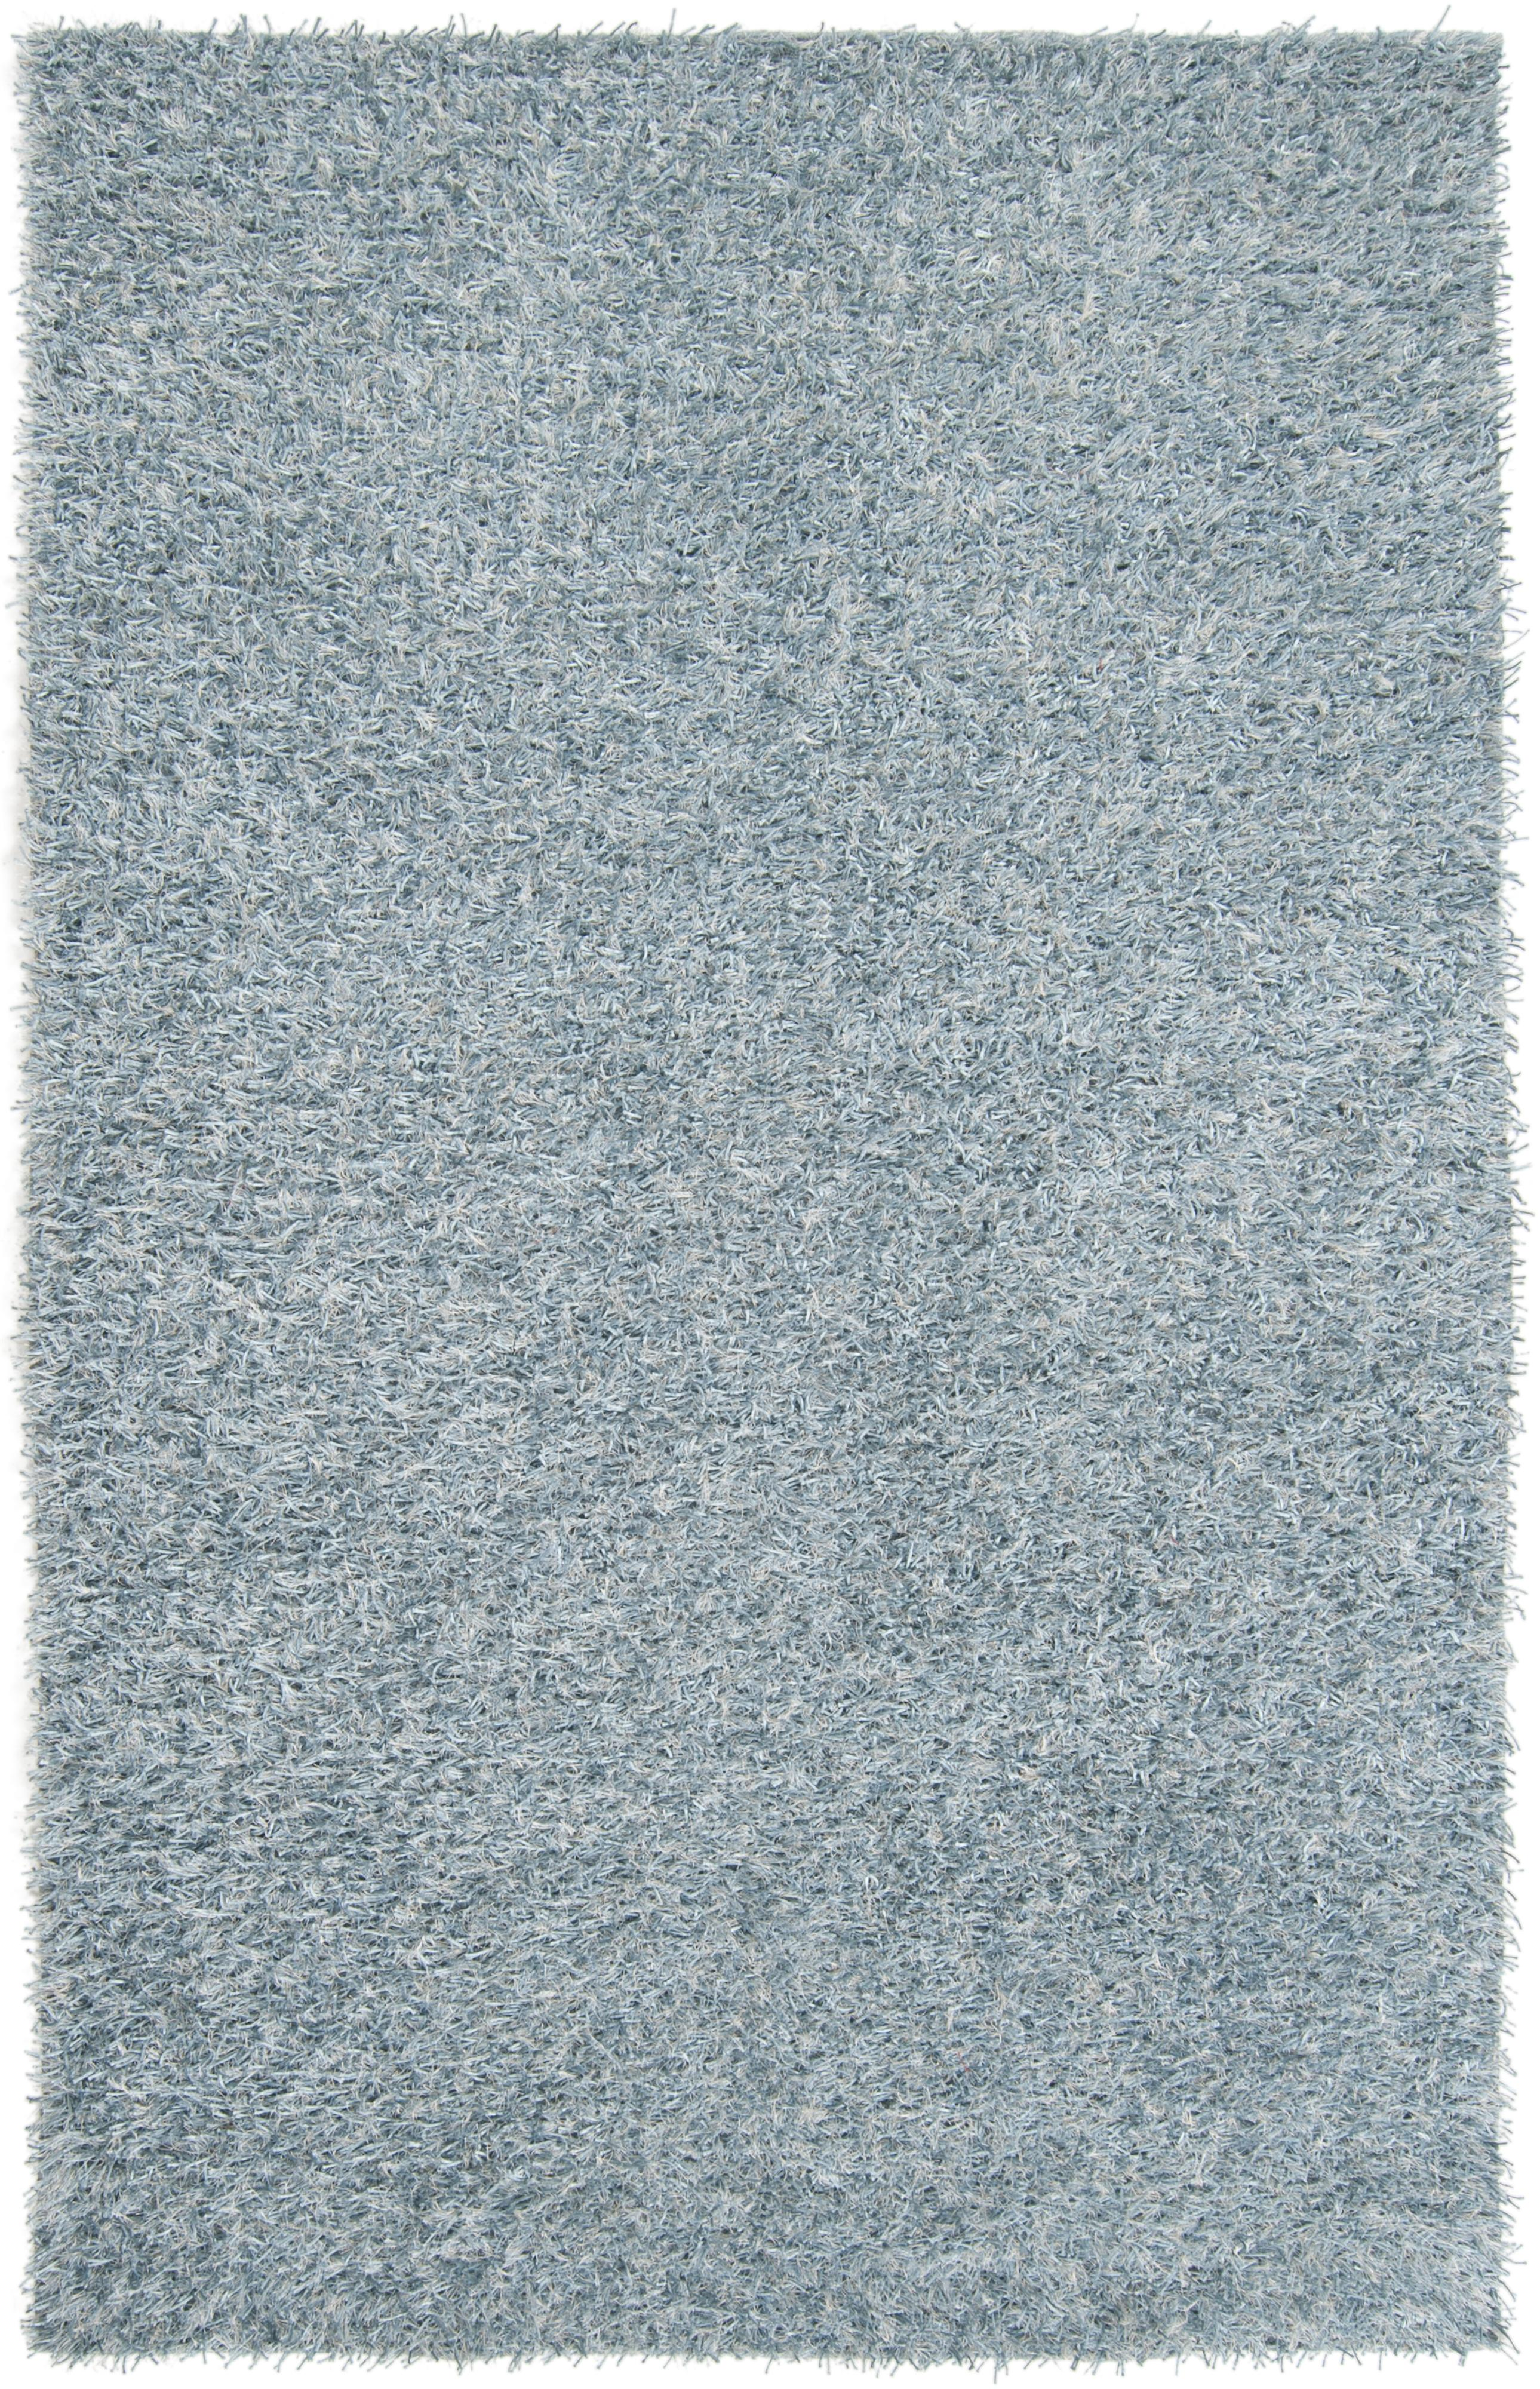 Taz 8' x 10' by 9596 at Becker Furniture